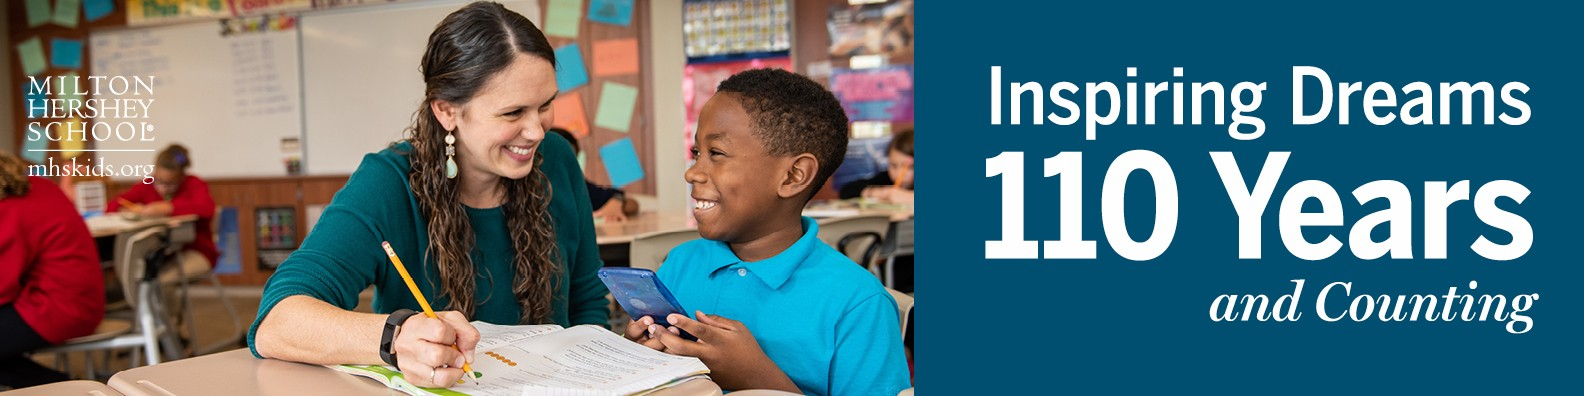 Milton Hershey School | LinkedIn